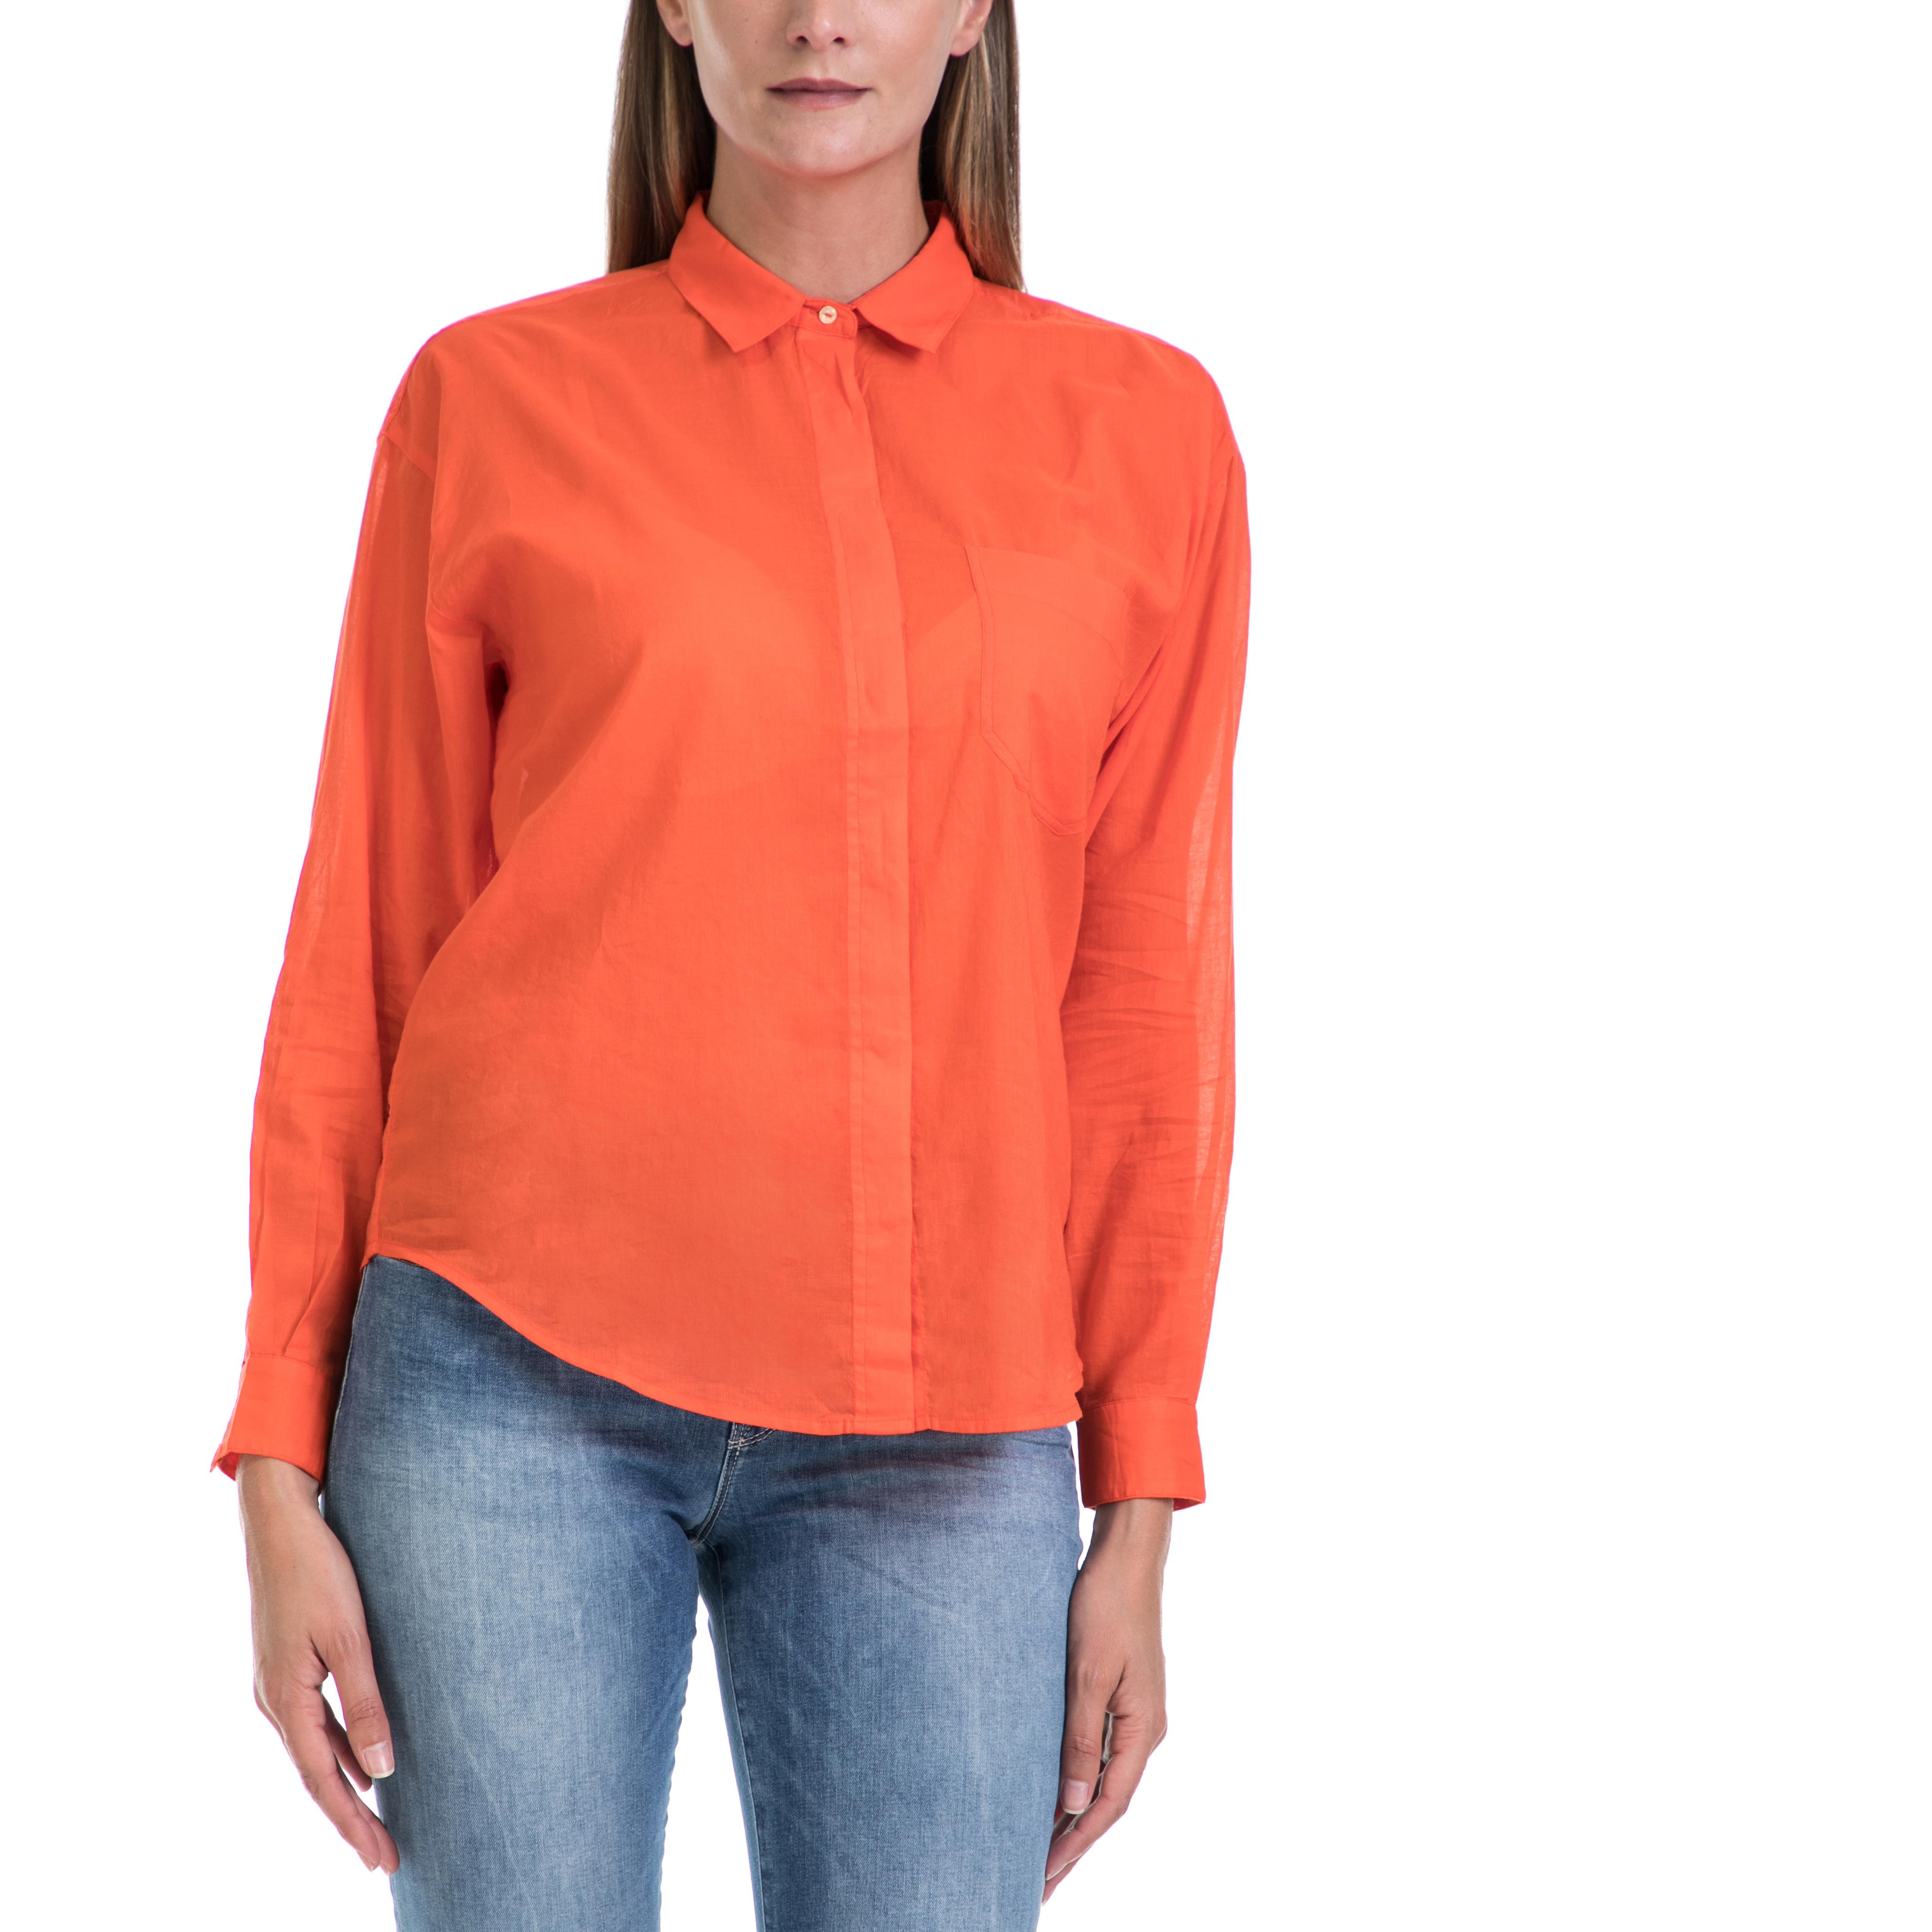 SCOTCH & SODA - Γυναικείο πουκάμισο MAISON SCOTCH πορτοκαλί γυναικεία ρούχα πουκάμισα μακρυμάνικα